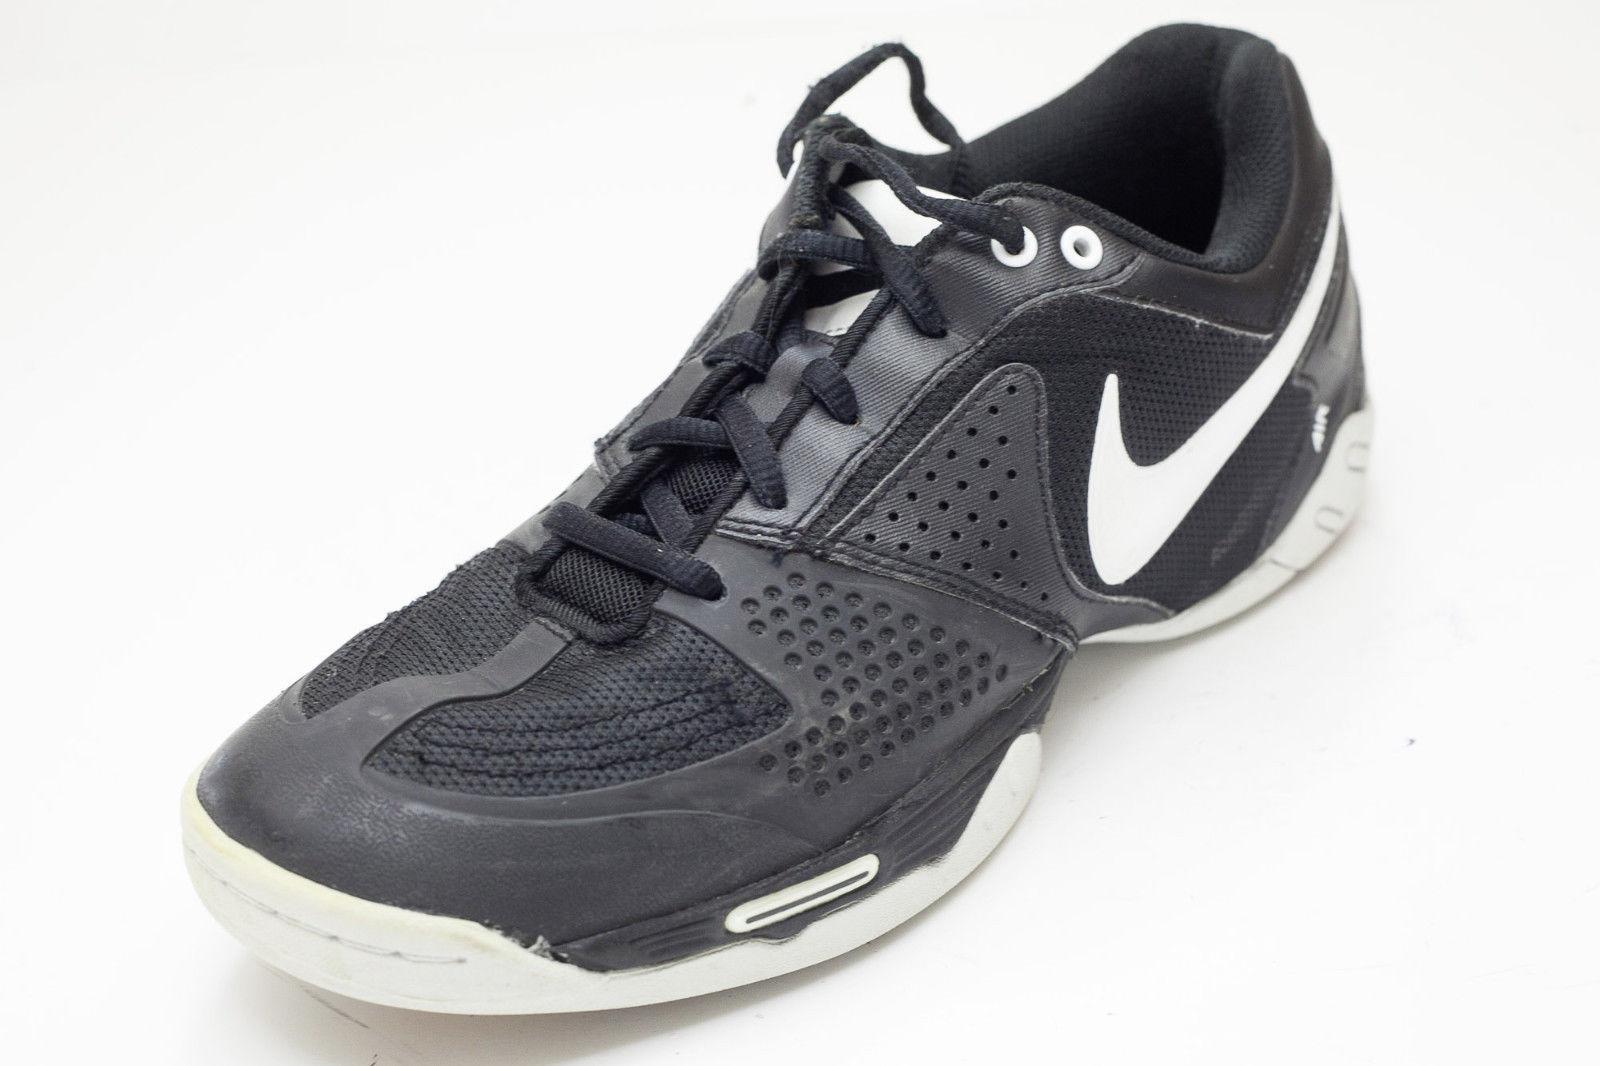 Nike 9 Black Court Shoes Women's